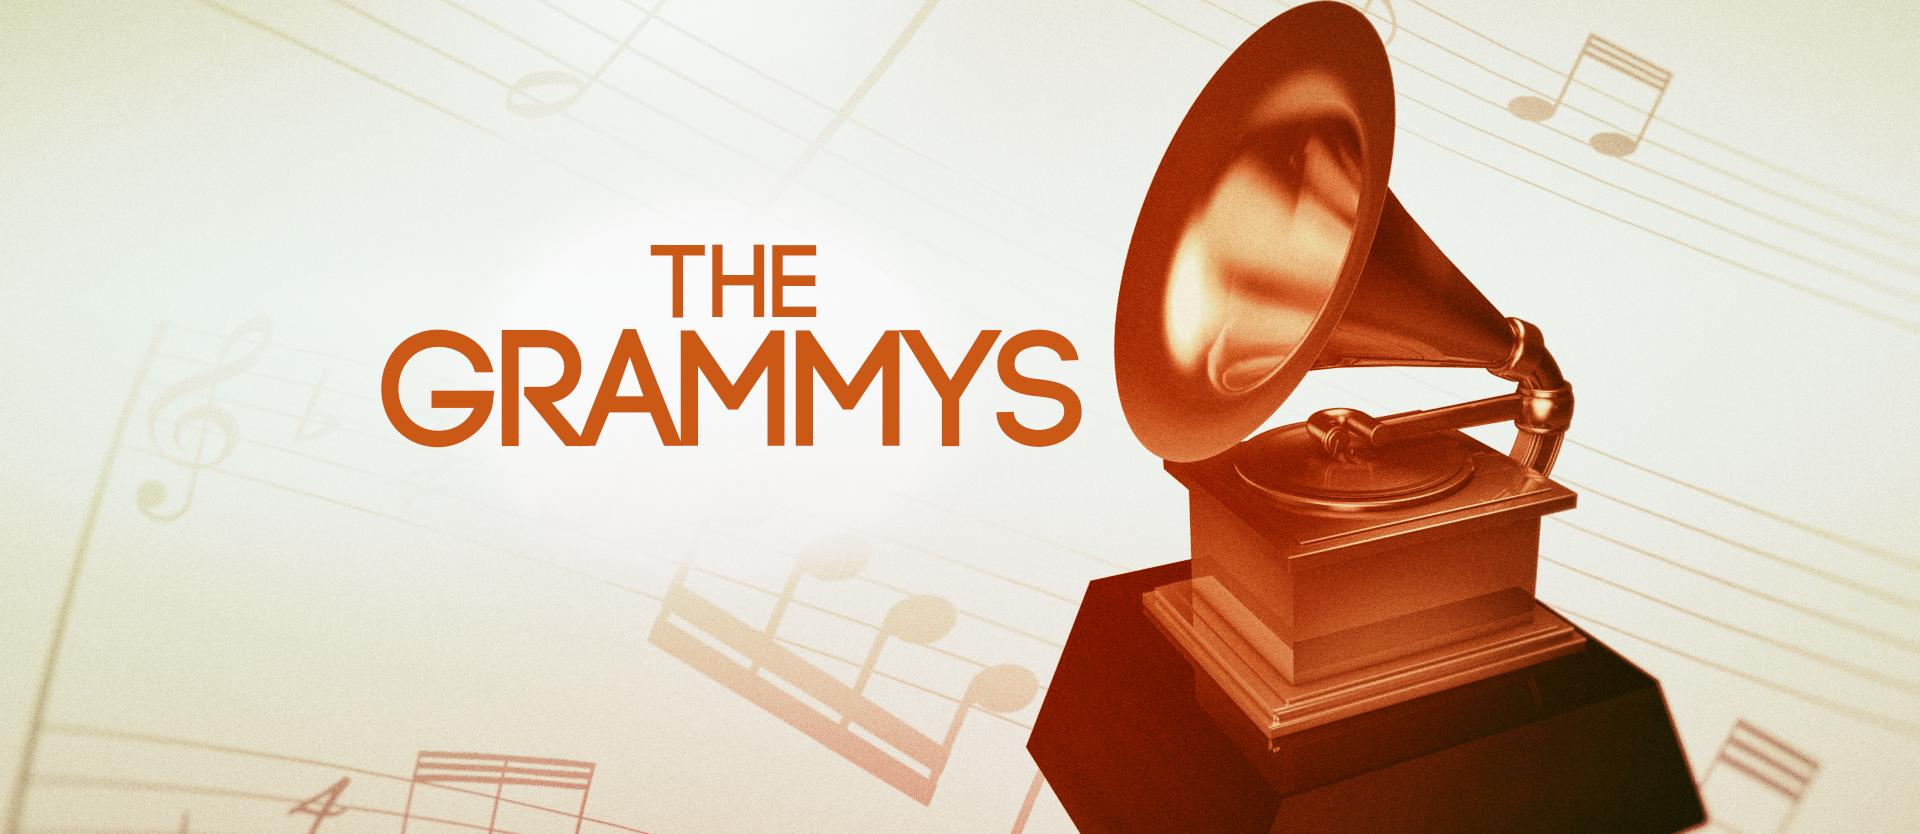 Grammys Generic